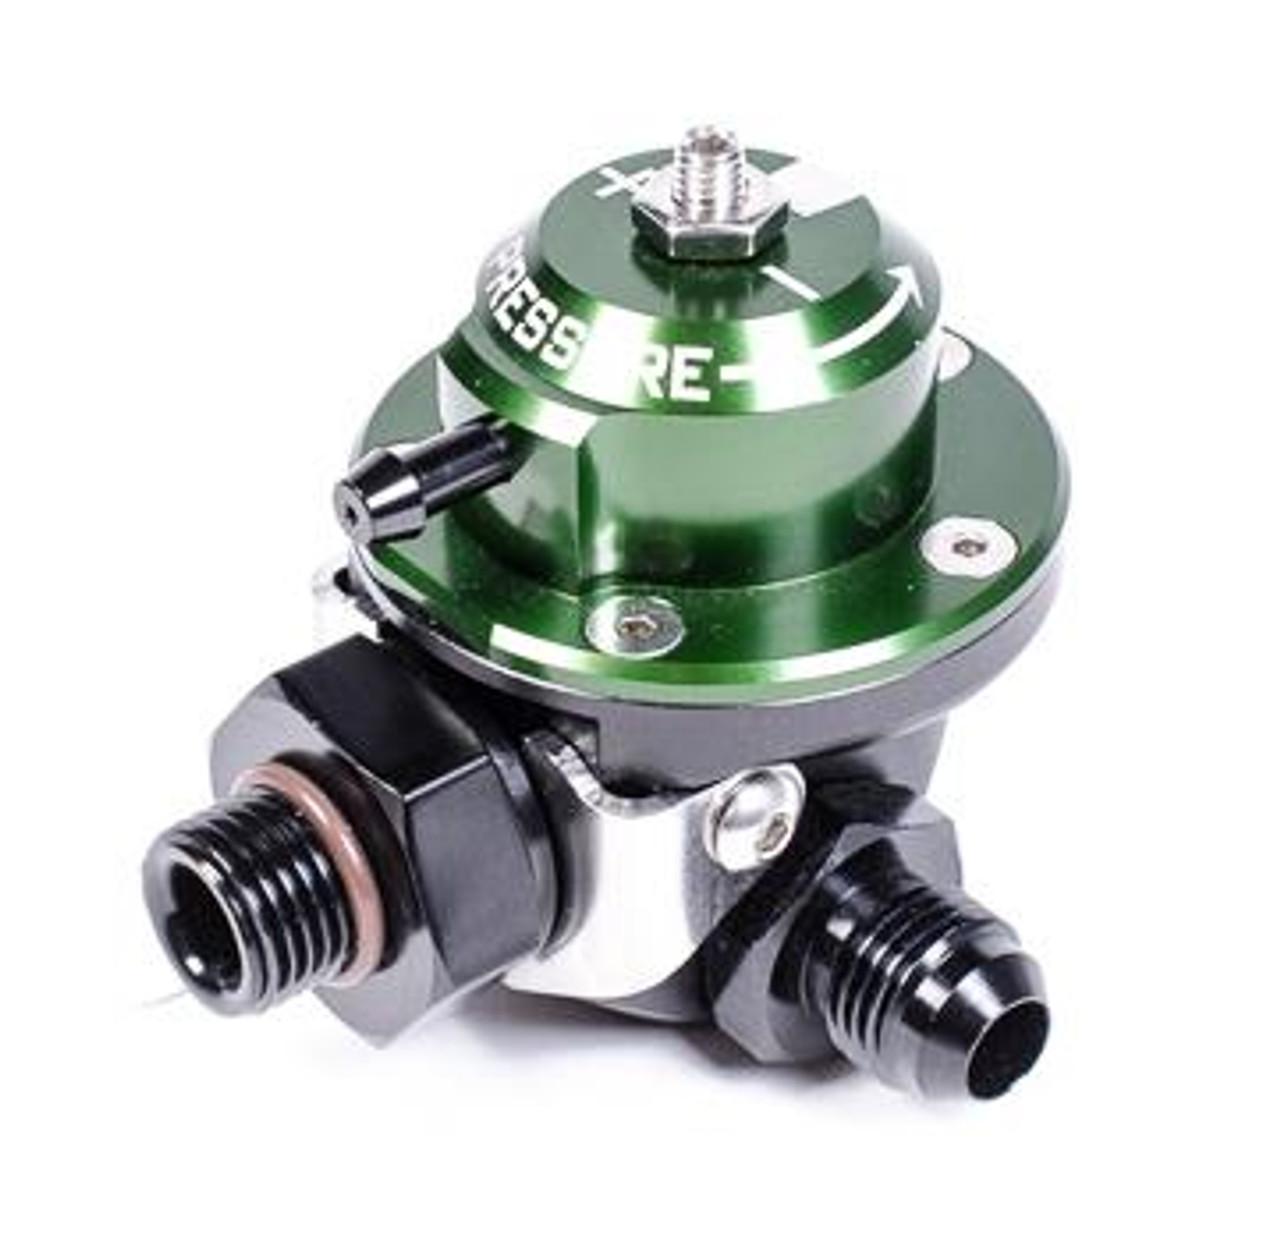 Radium Engineering DMR Fuel Pressure Regulator 8AN ORB (Green) - 20-0223-01